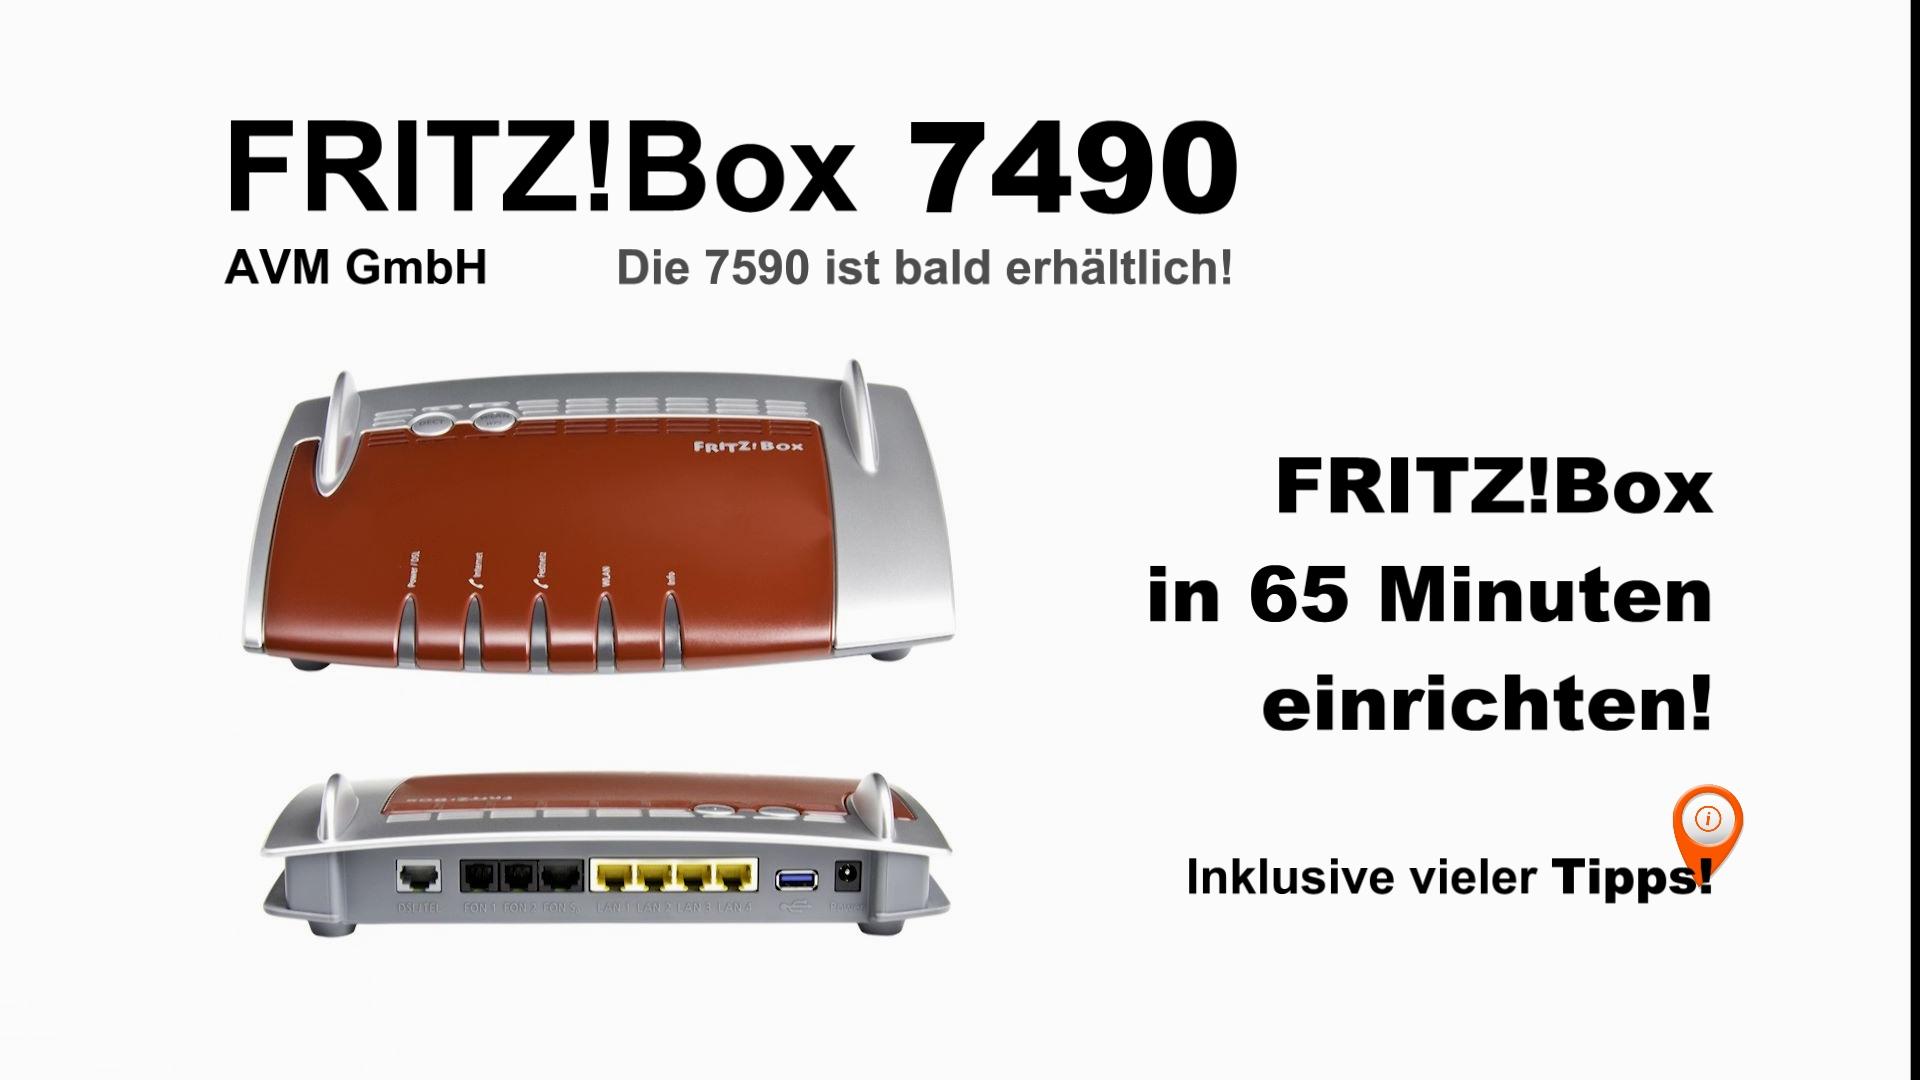 FRITZ!Box 7490 einrichten, inkl. Telekom DSL Anschluss konfigurieren